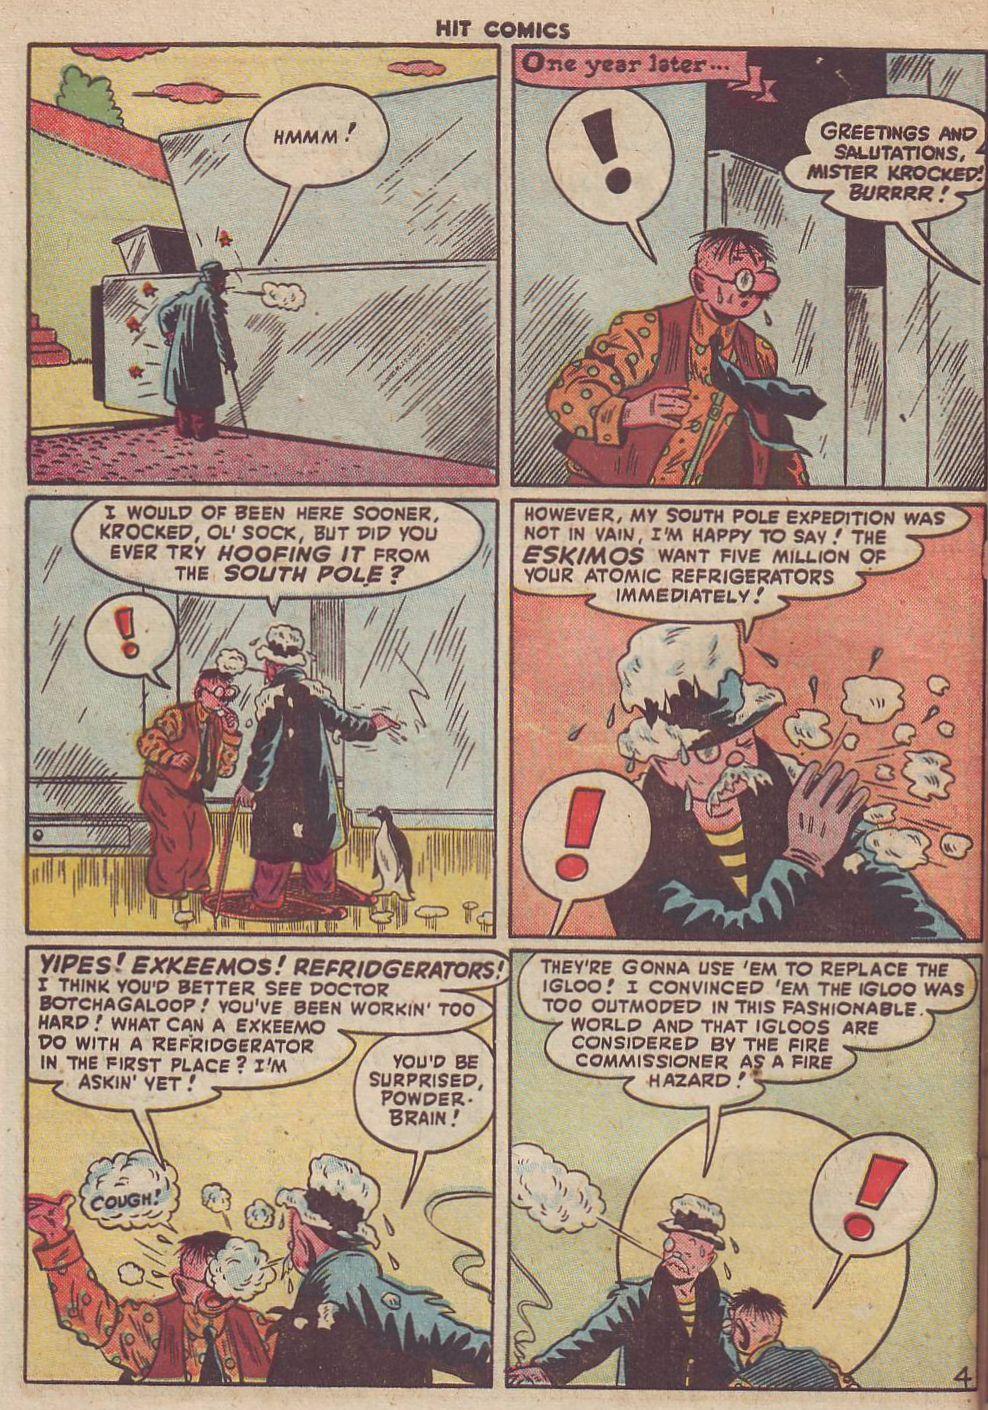 Read online Hit Comics comic -  Issue #51 - 42